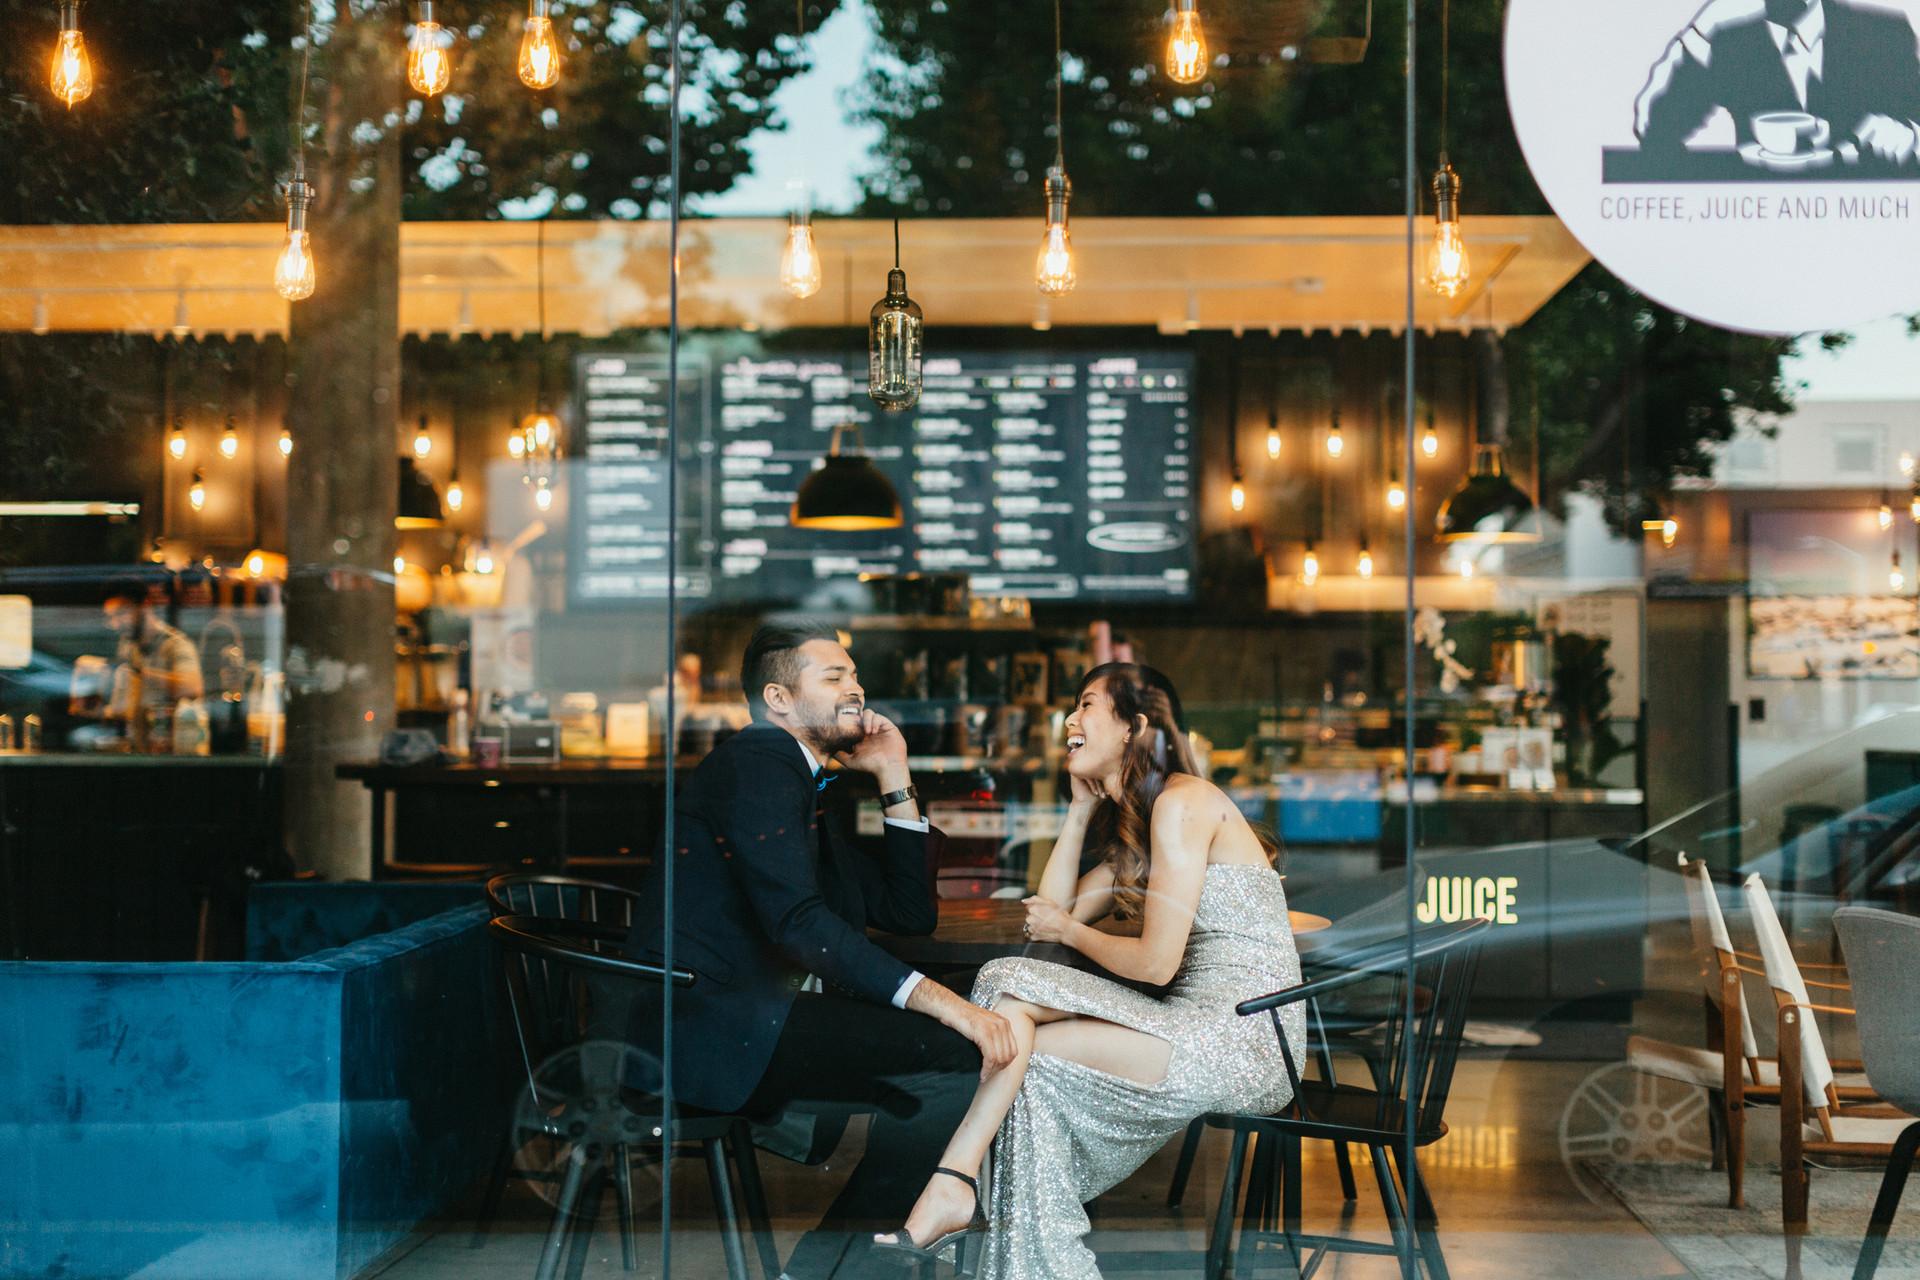 california coffee shop engagement photos